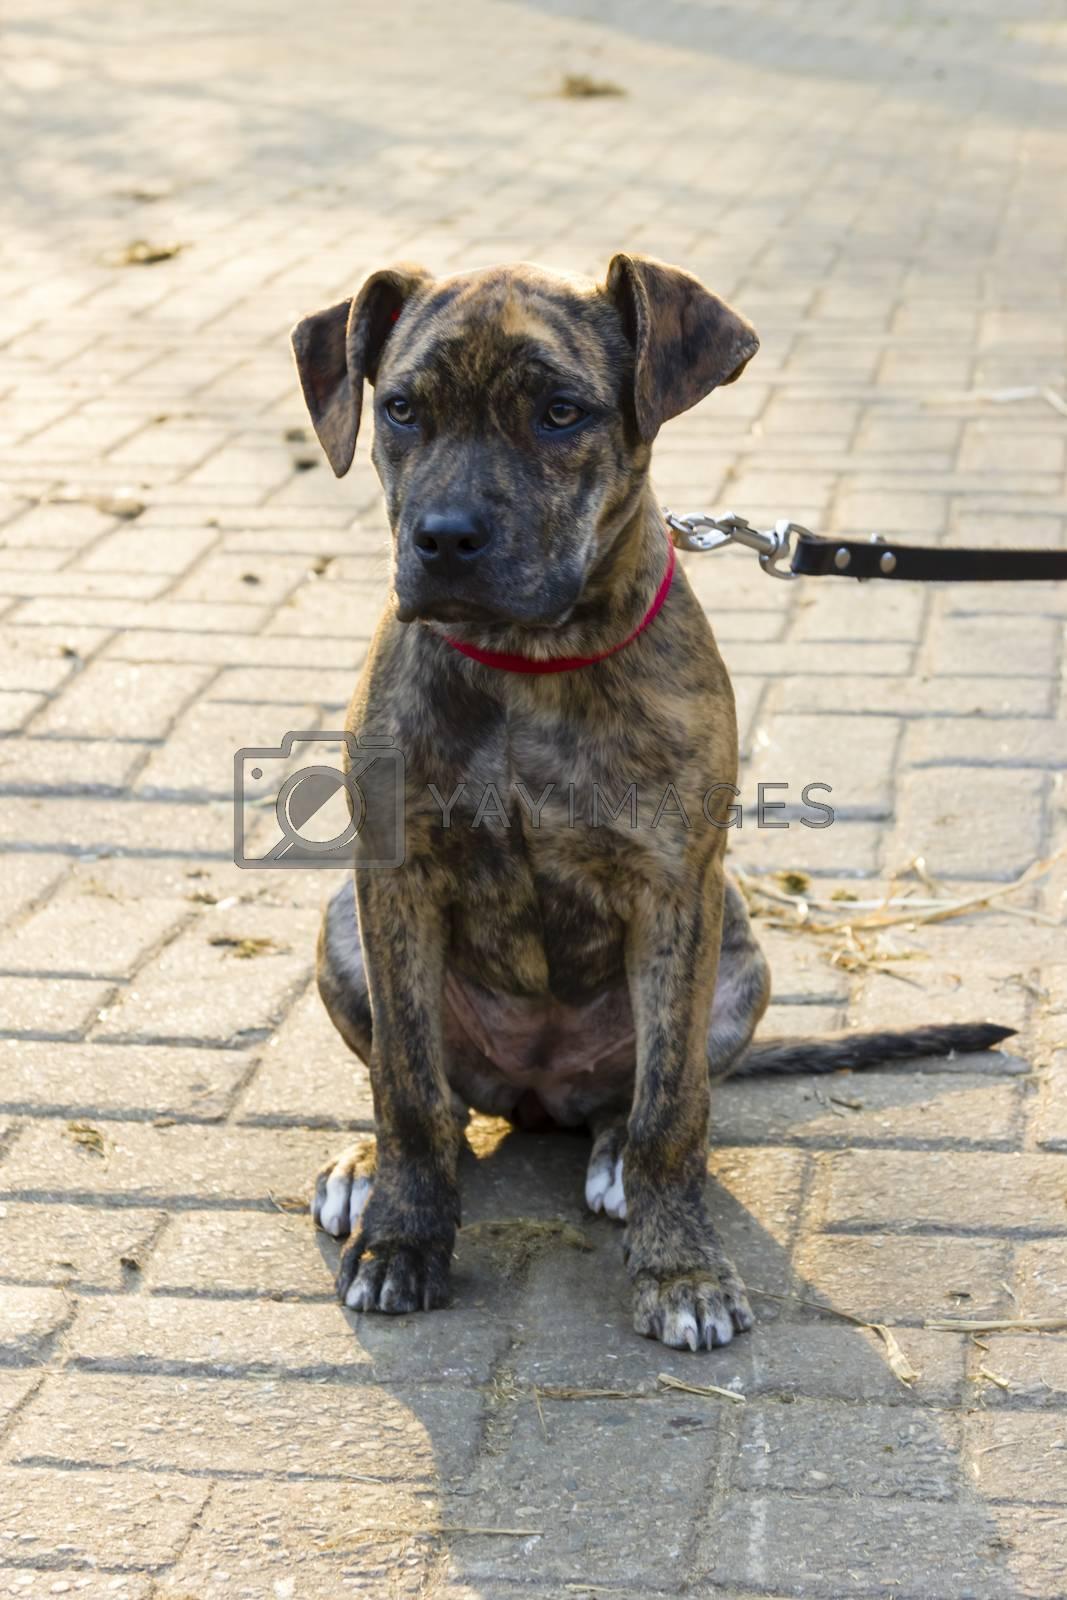 Royalty free image of piebald short-haired catahoula bulldog puppy sitting by Tetyana